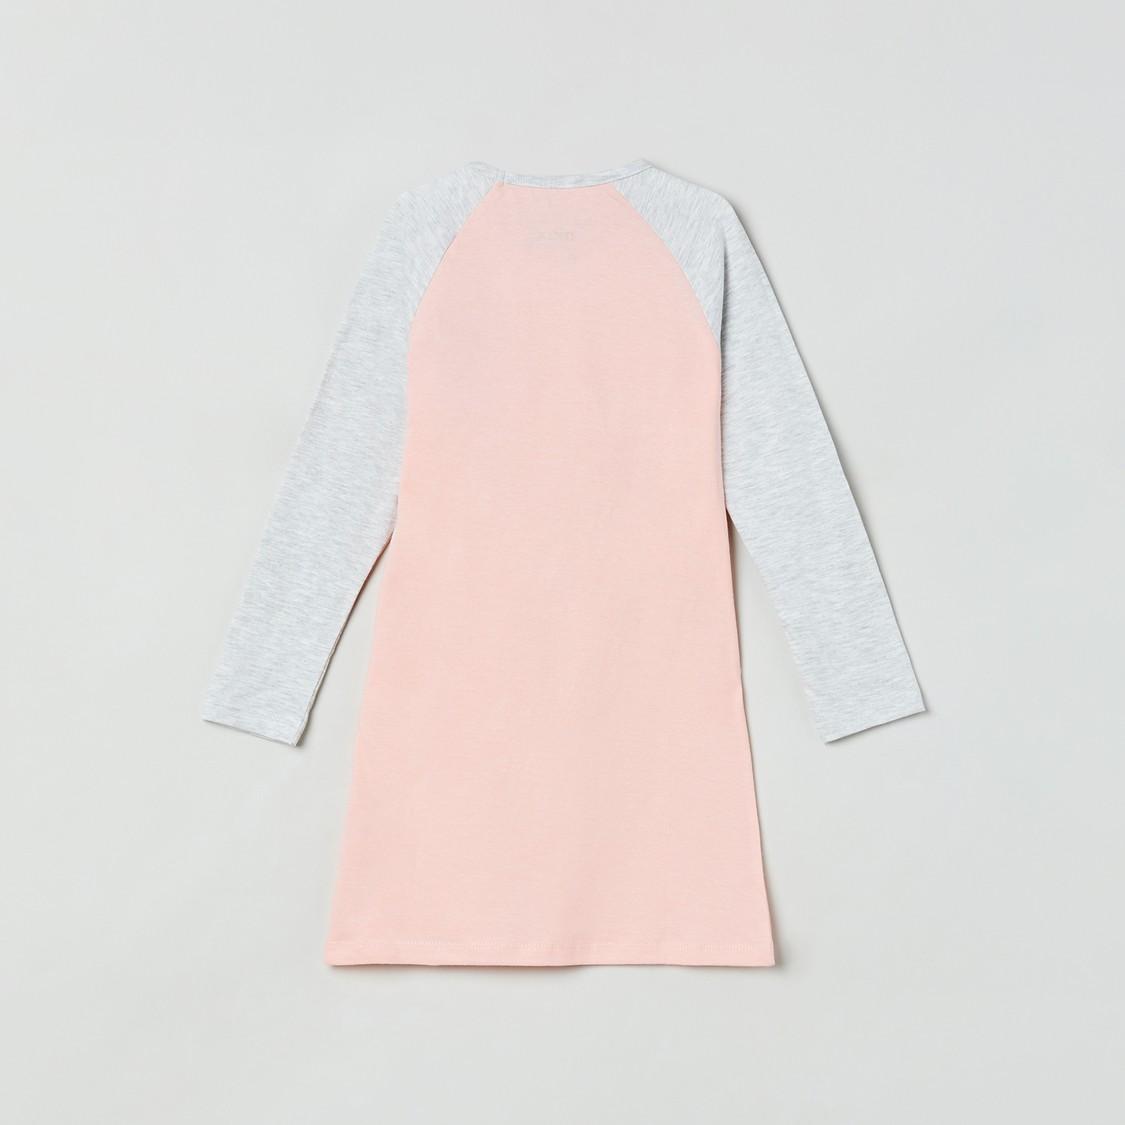 MAX Colourblock Night Dress with Applique